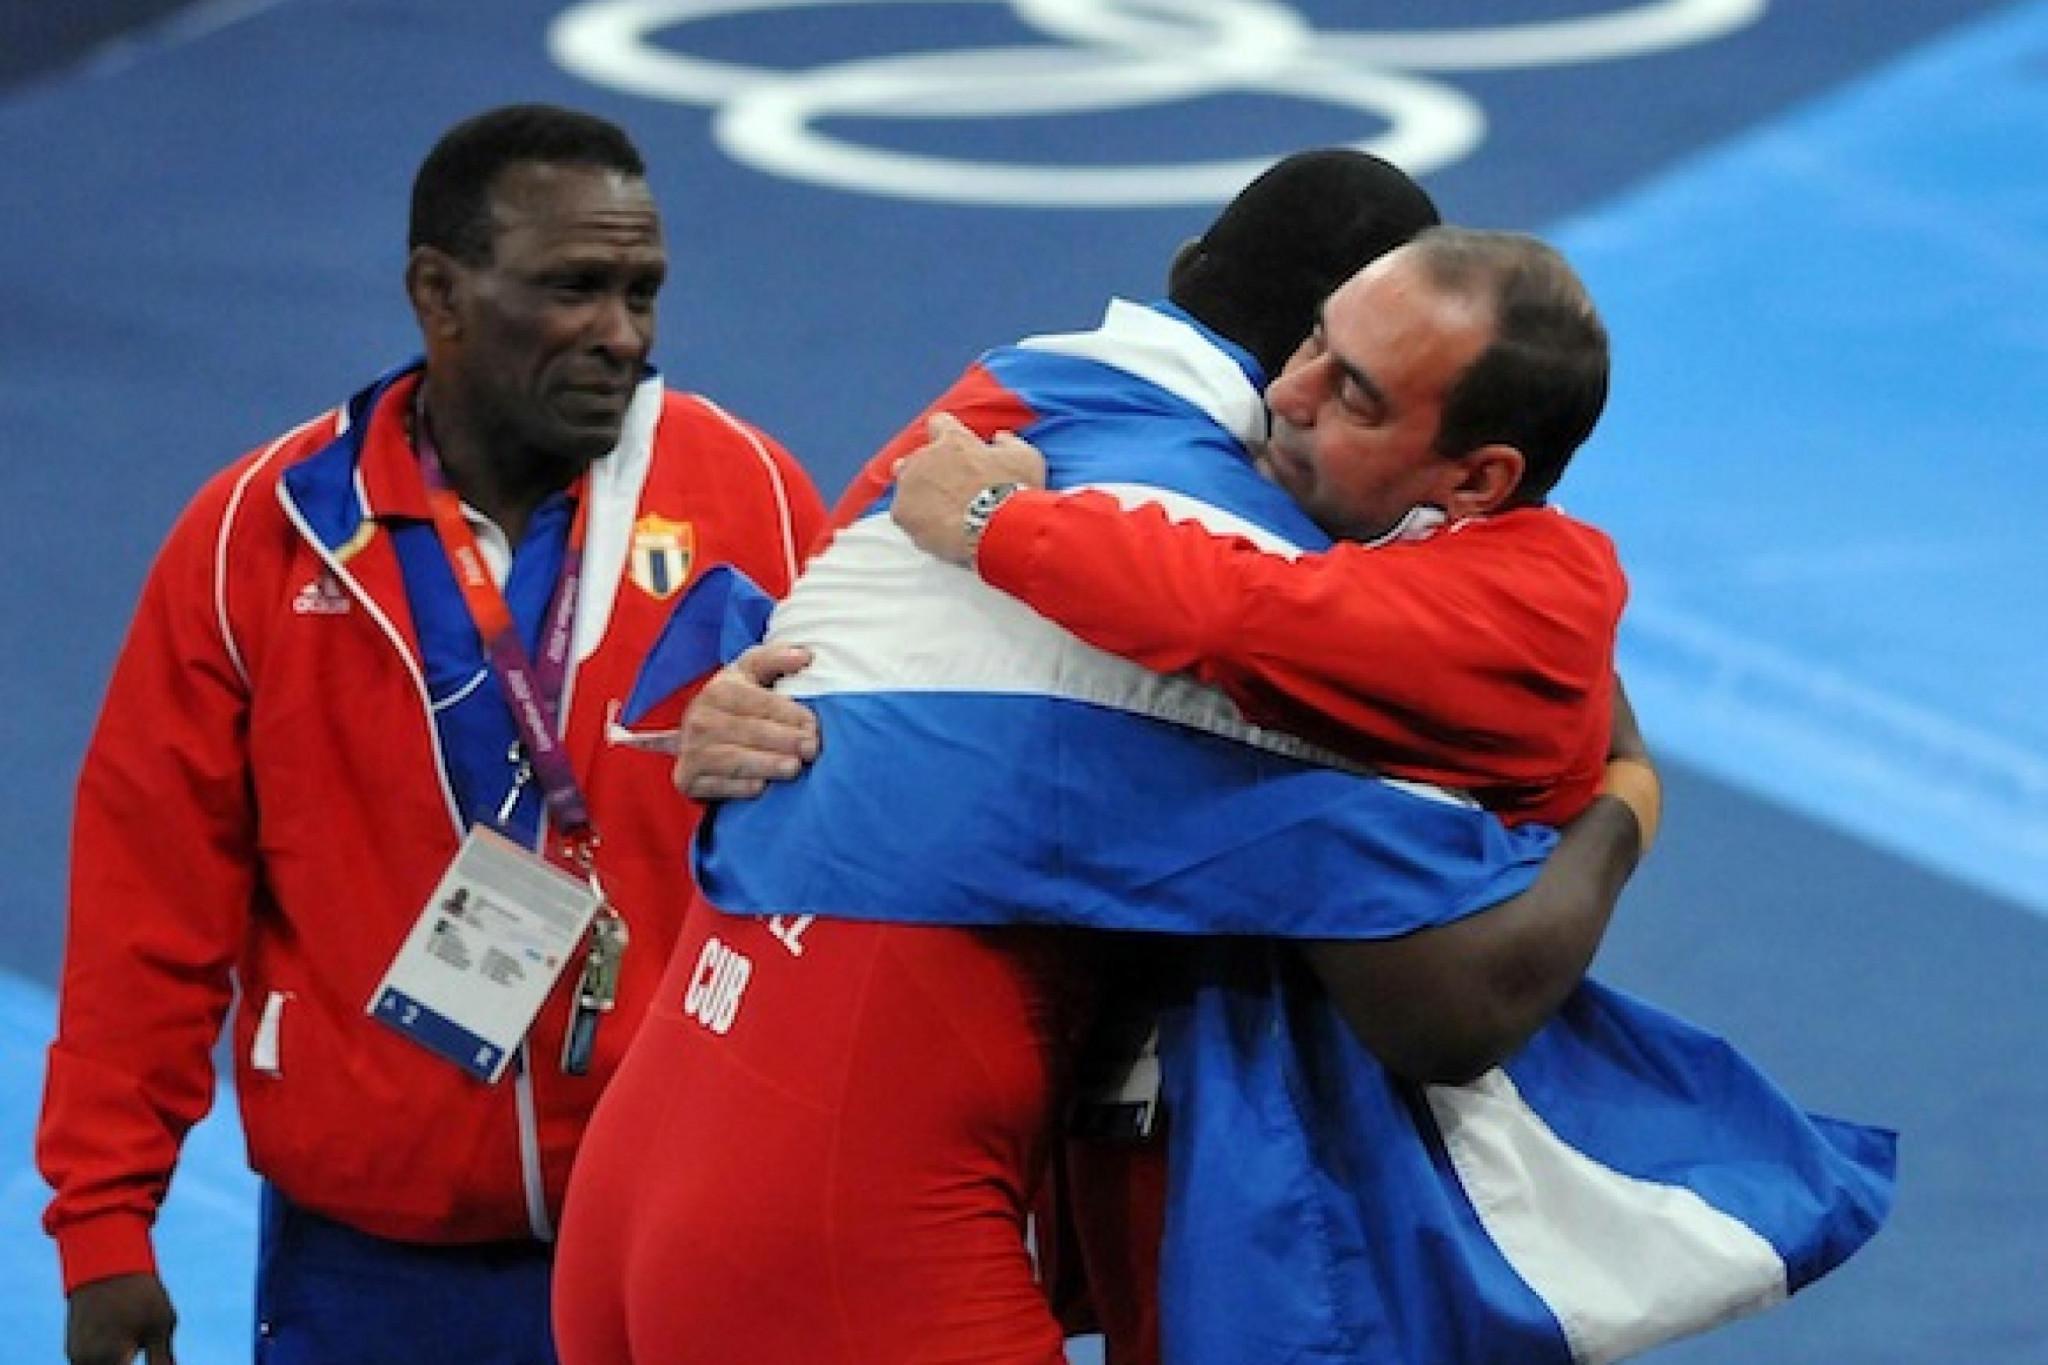 Cuba seal maximum Olympics quota spots in Greco-Roman wrestling